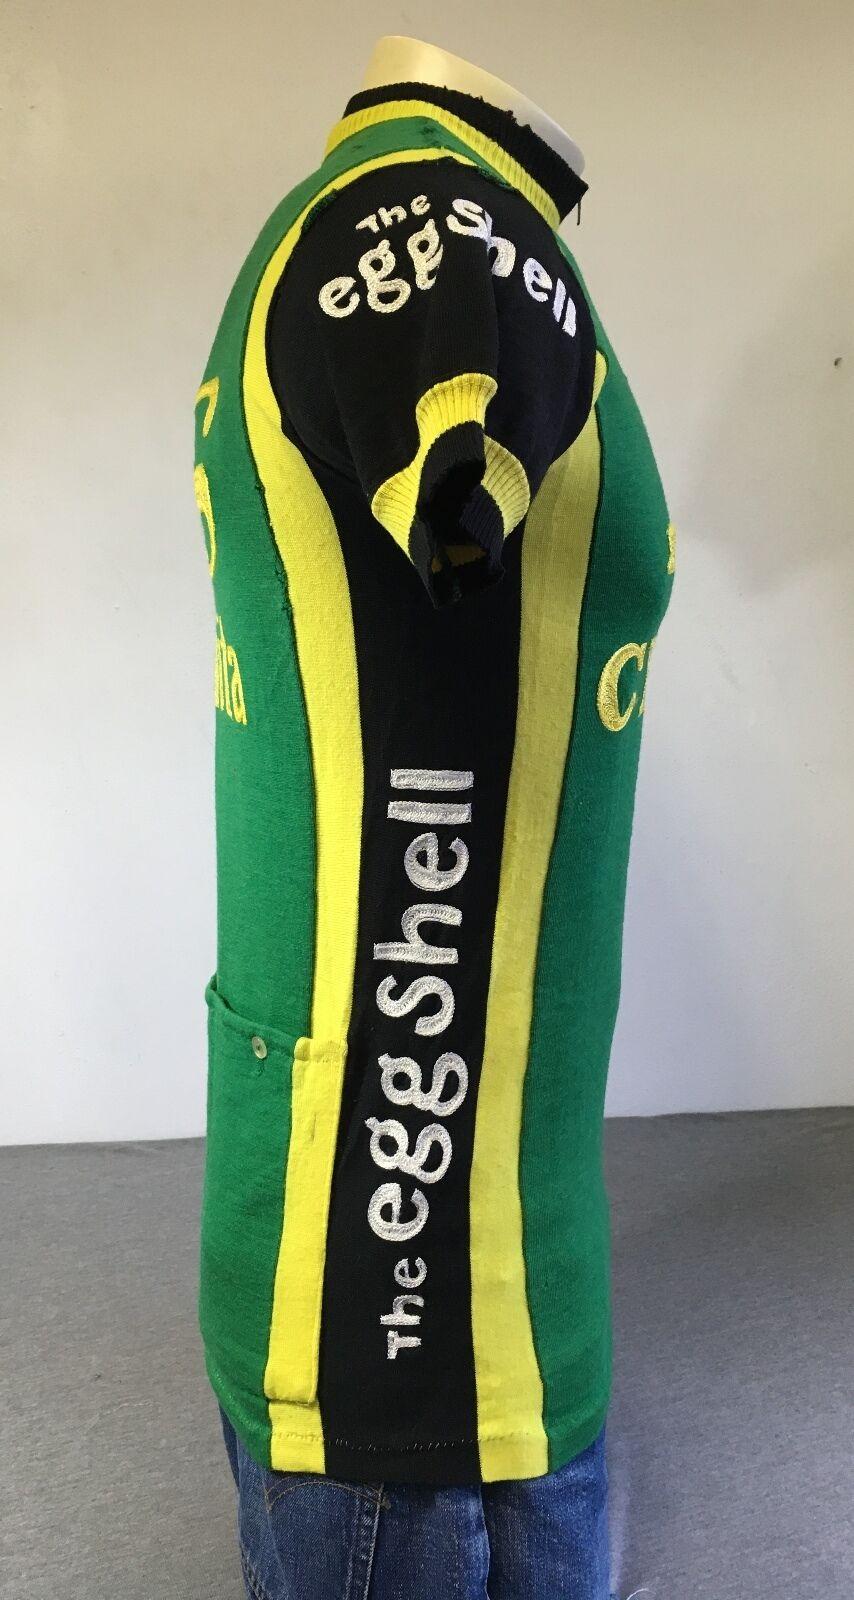 SANTINI Cycling Jersey Team GS Cicla Vita 80s Baleno Vtg Baleno 80s Wool ITALY Eggshell Sew 38daa4